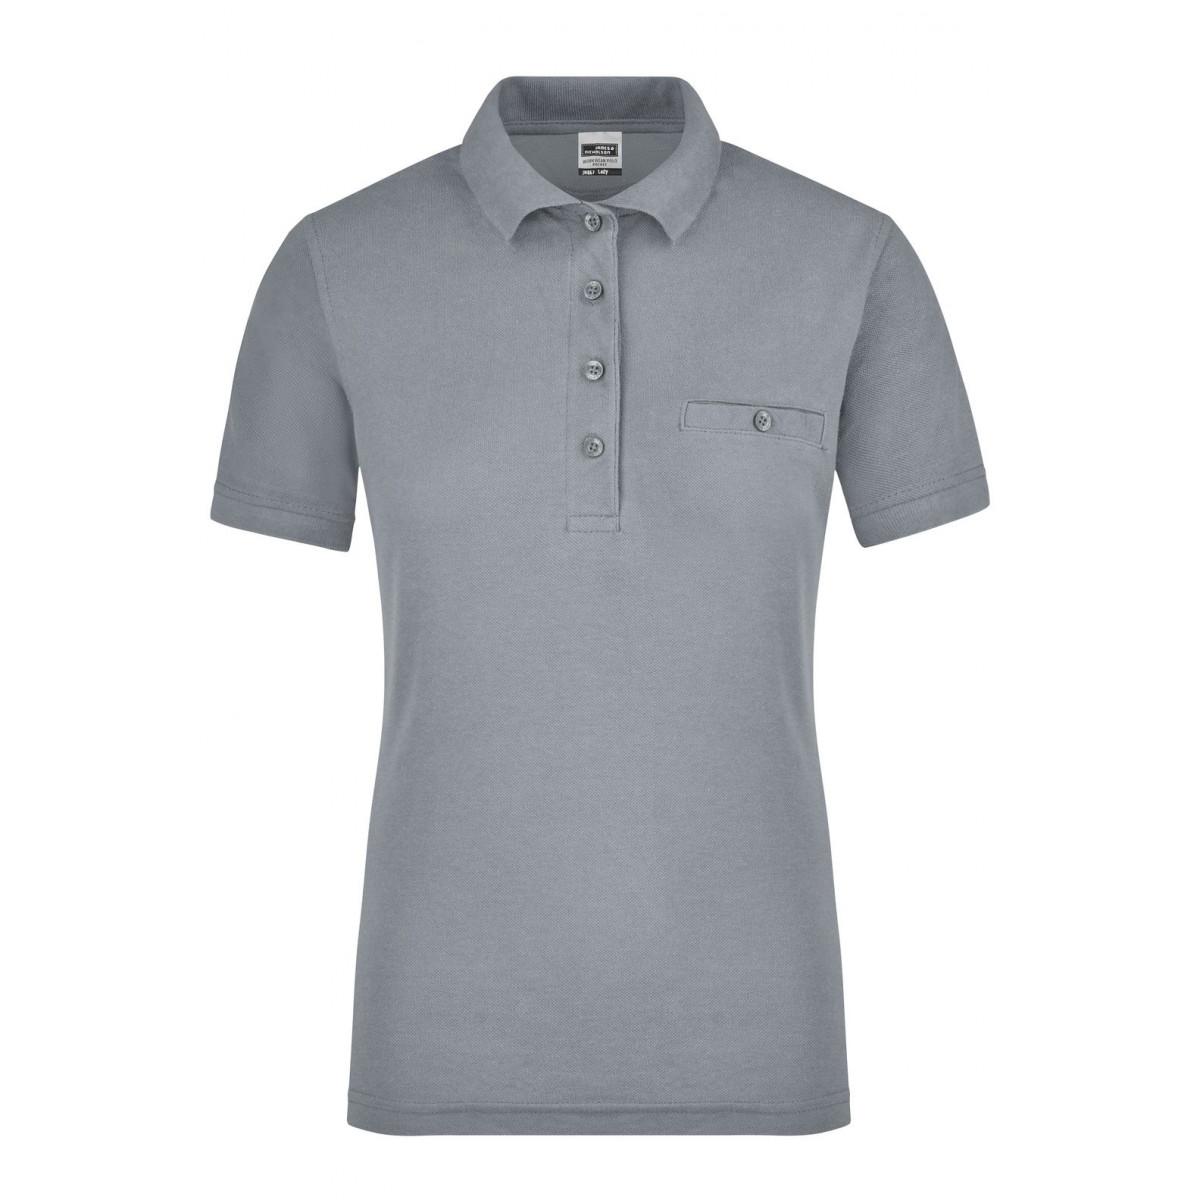 Рубашка поло женская JN867 Ladies Workwear Polo Pocket - Серый меланж